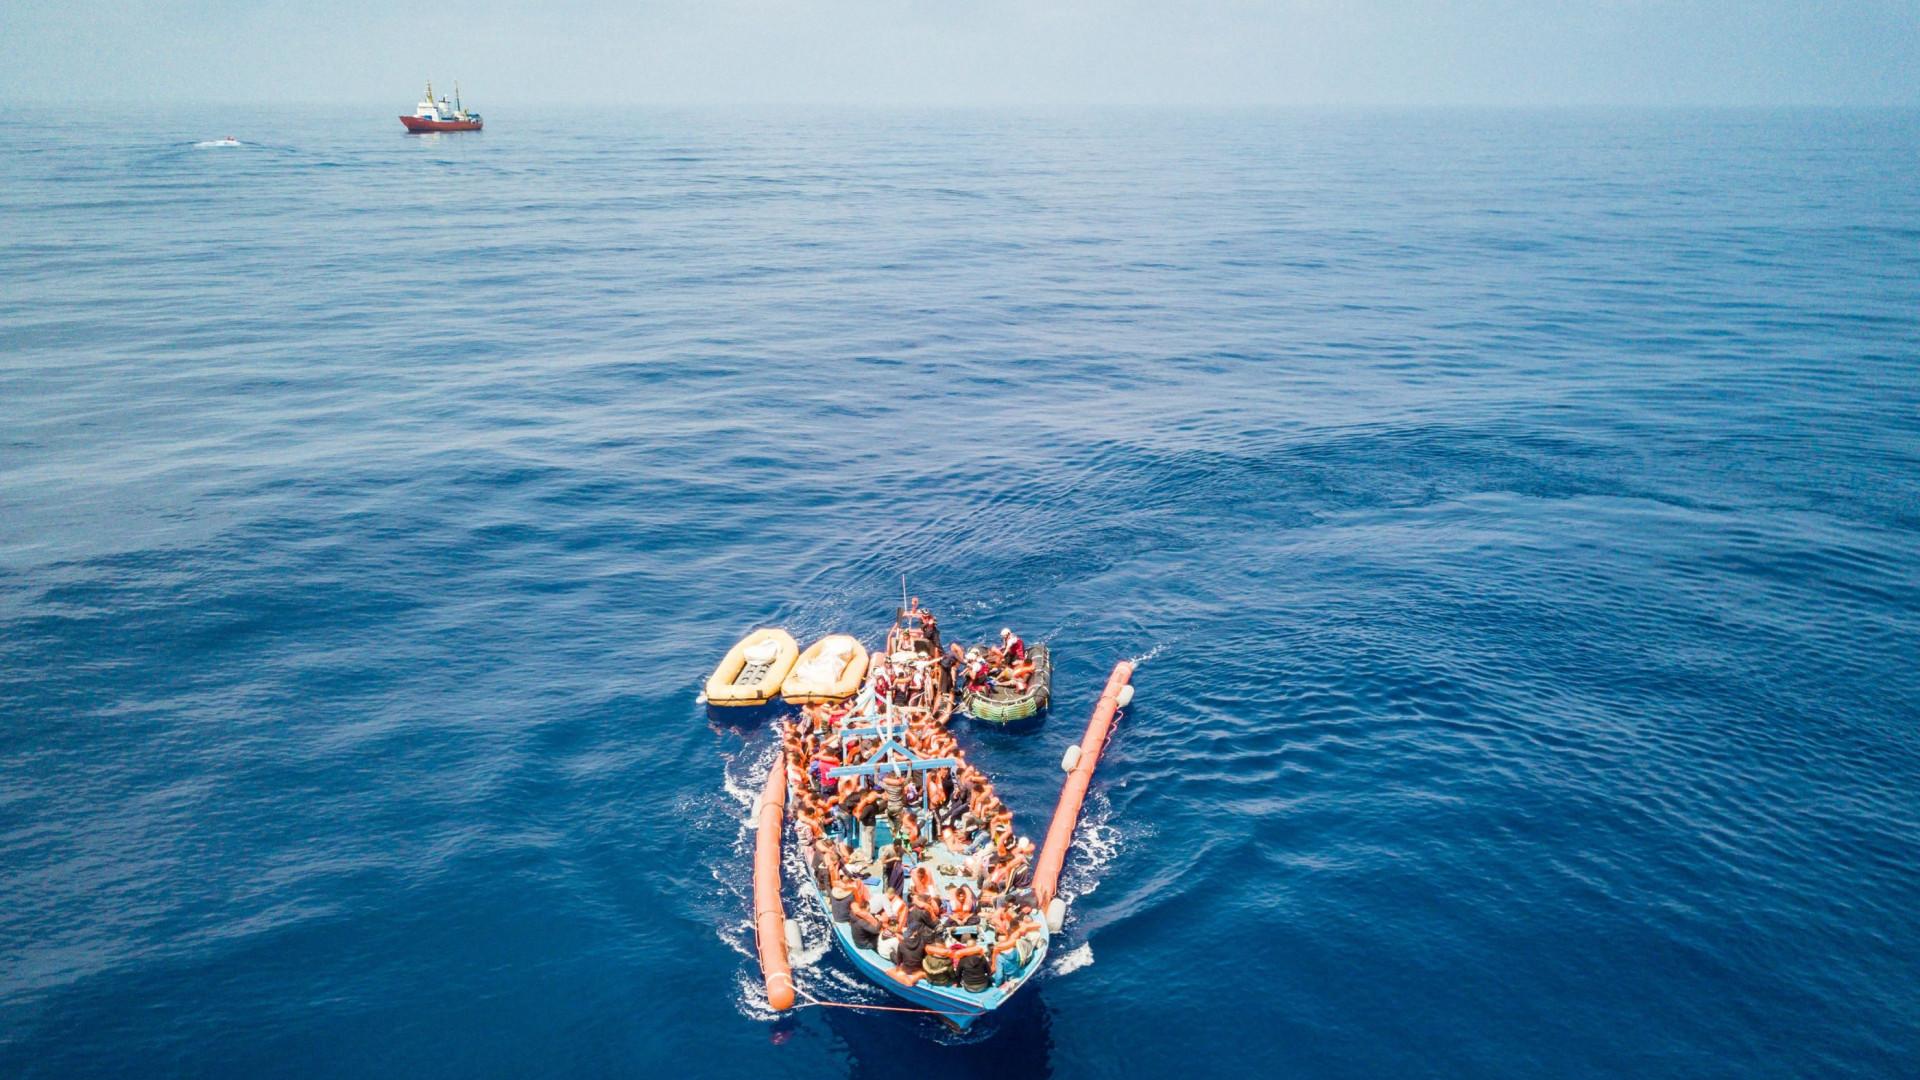 Naufrágio de balsa deixa 4 mortos e 14 desaparecidos no Marrocos